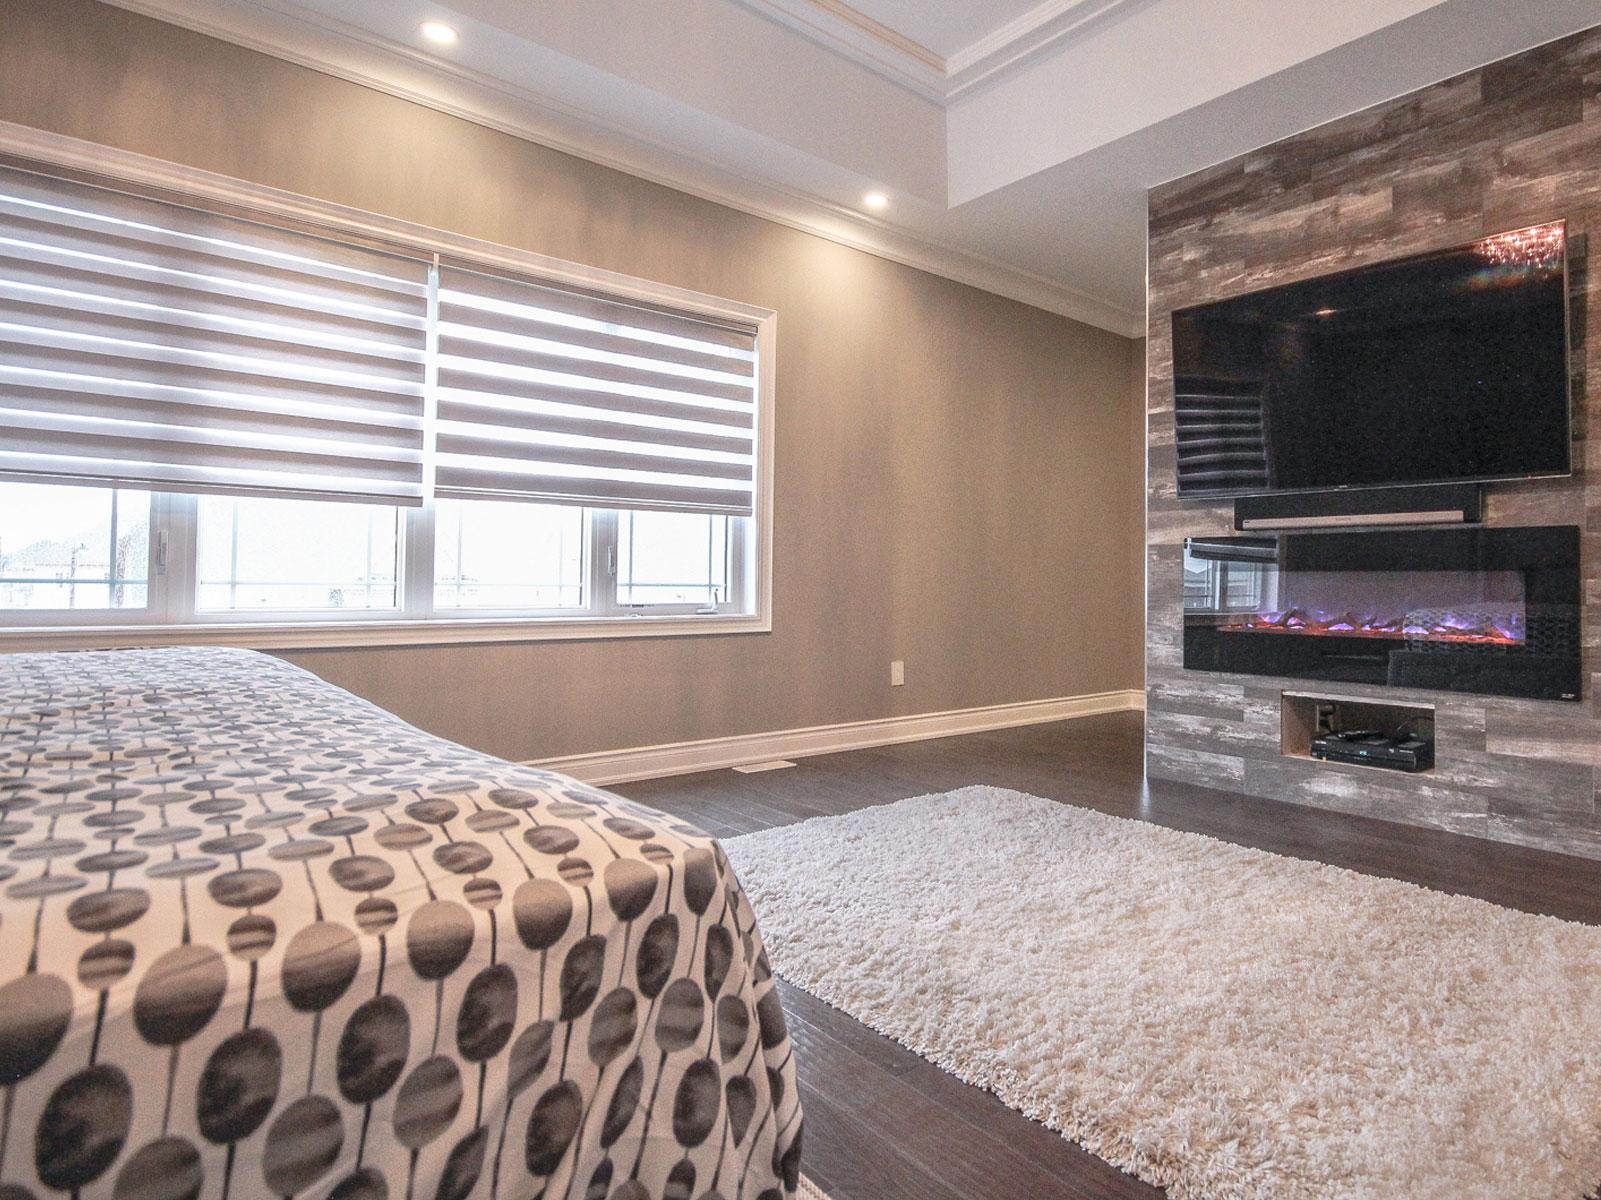 zebra-shades-bedroom.jpg